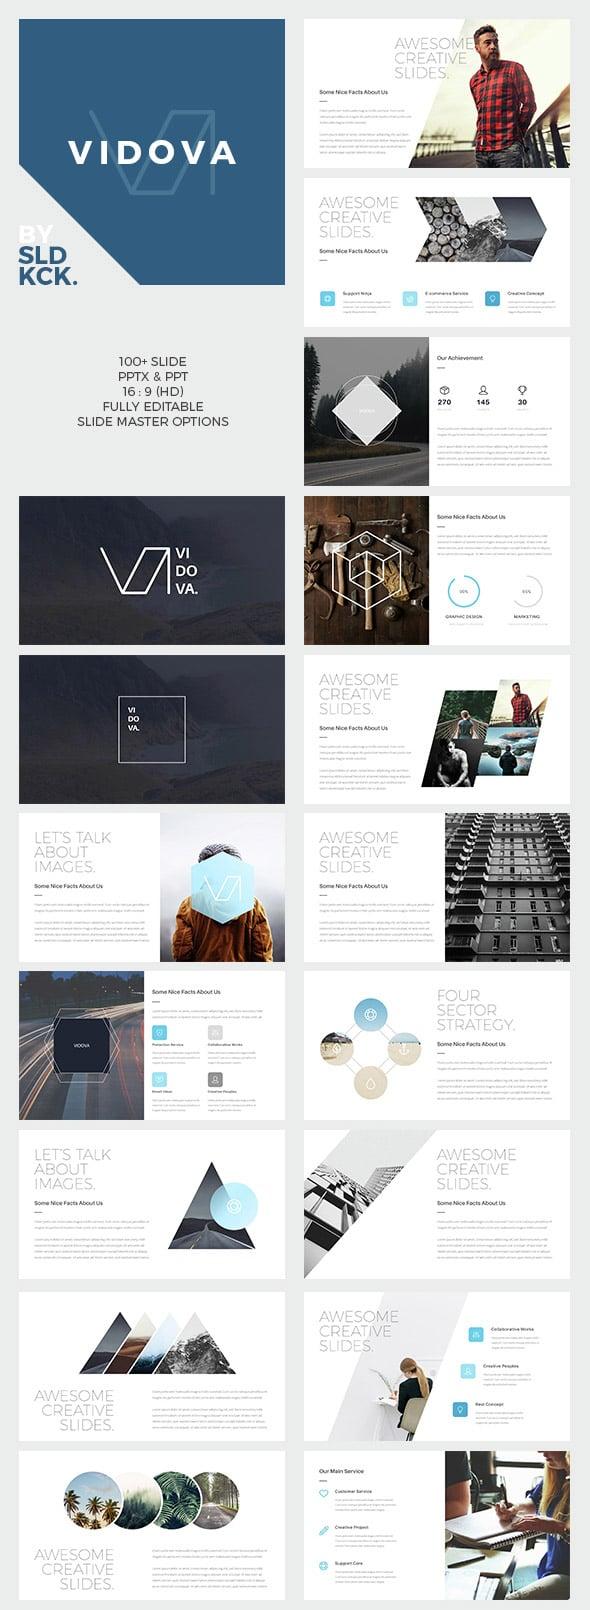 Vidova - Modern PPT Presentation Template Design